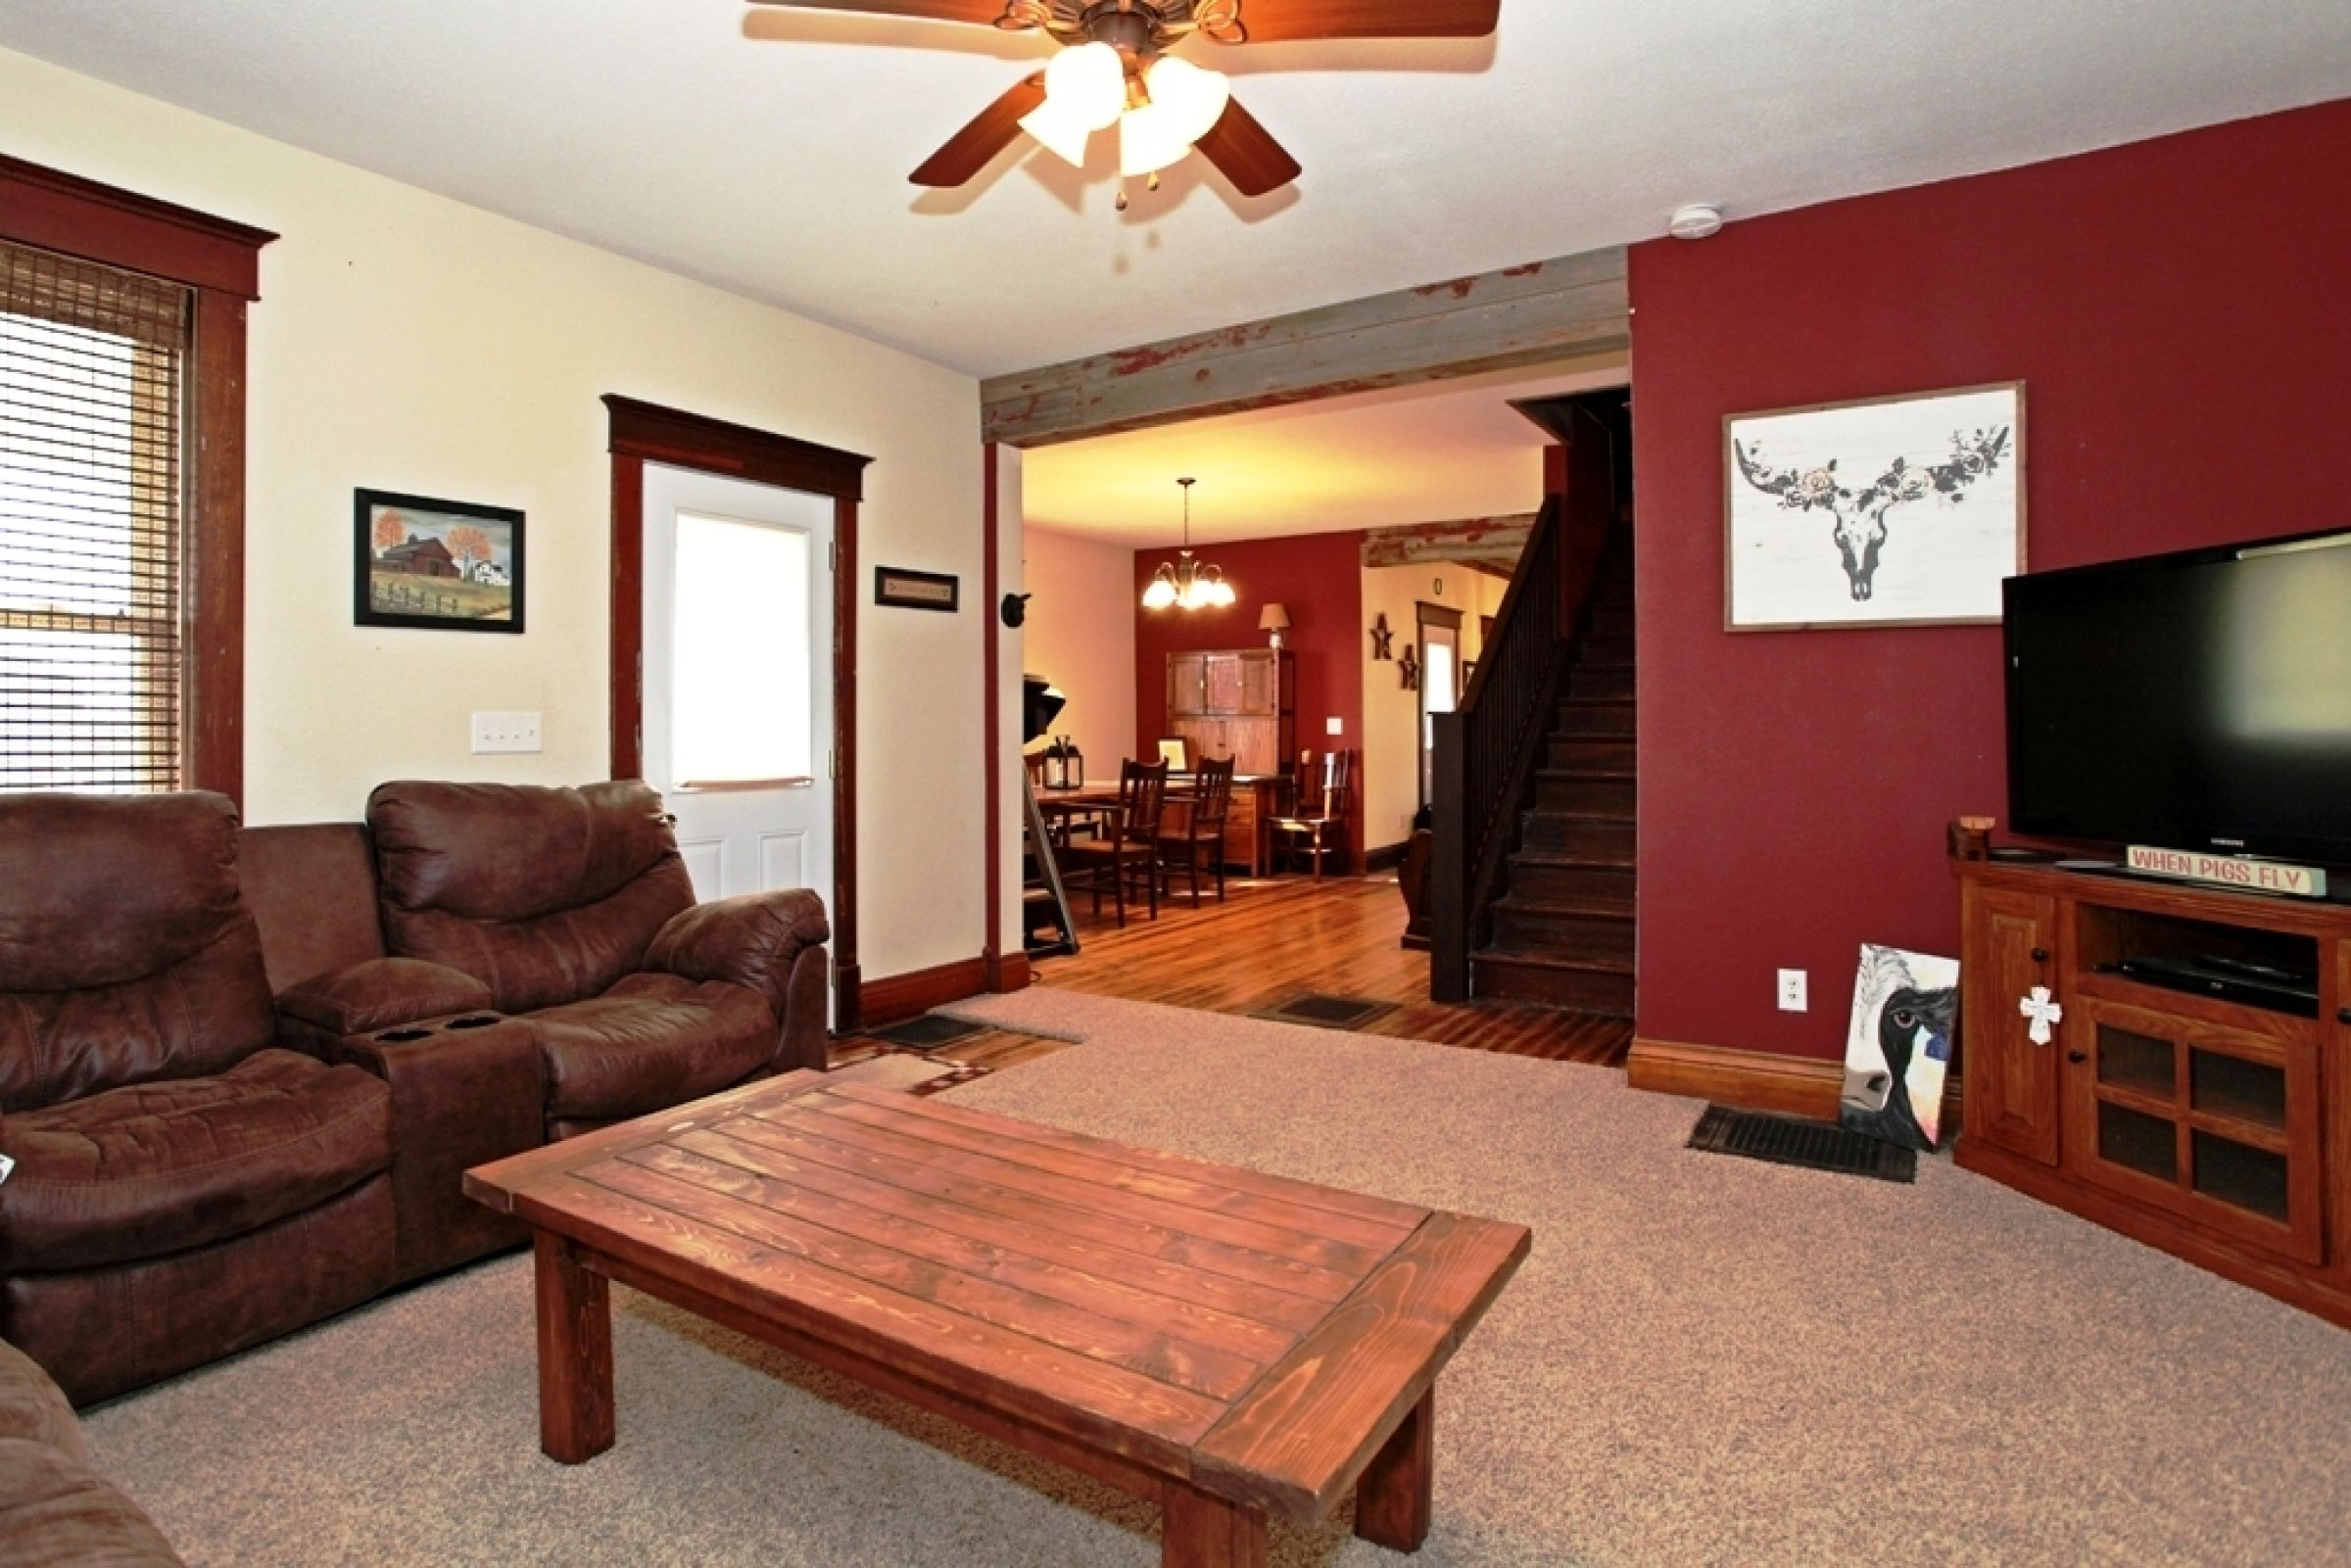 residential-wayne-county-iowa-1-acres-listing-number-15243-11-2020-11-05-200146.JPG